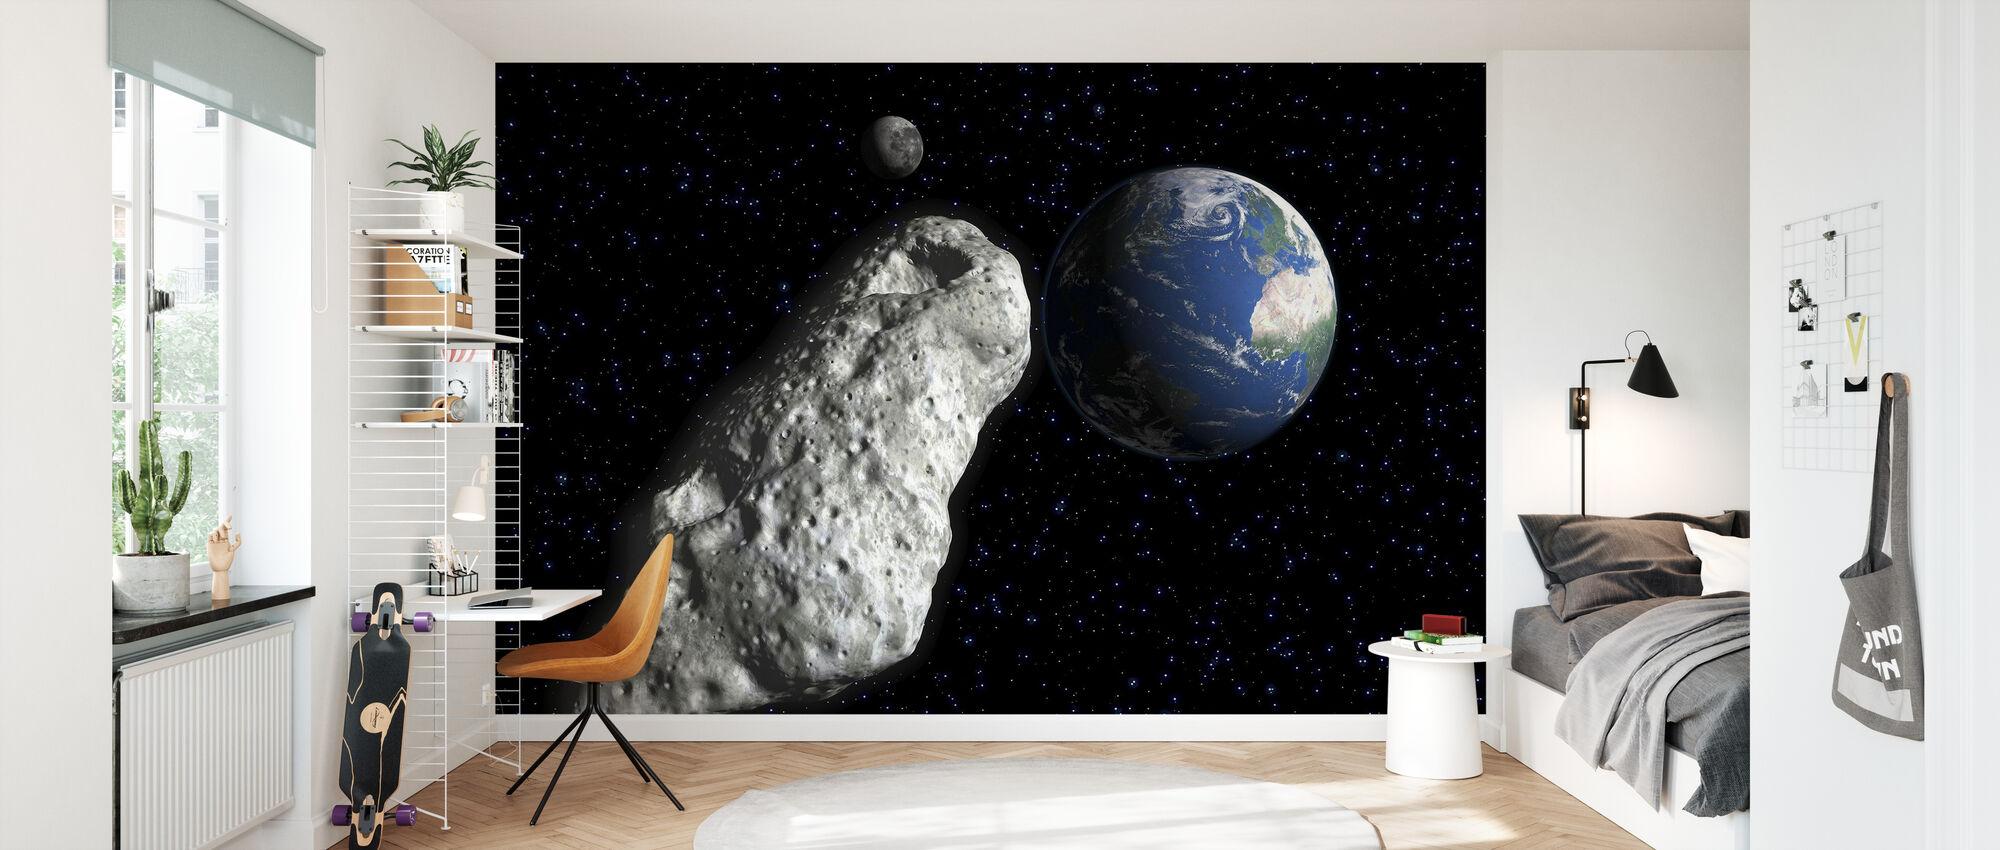 Asteroid - Wallpaper - Kids Room